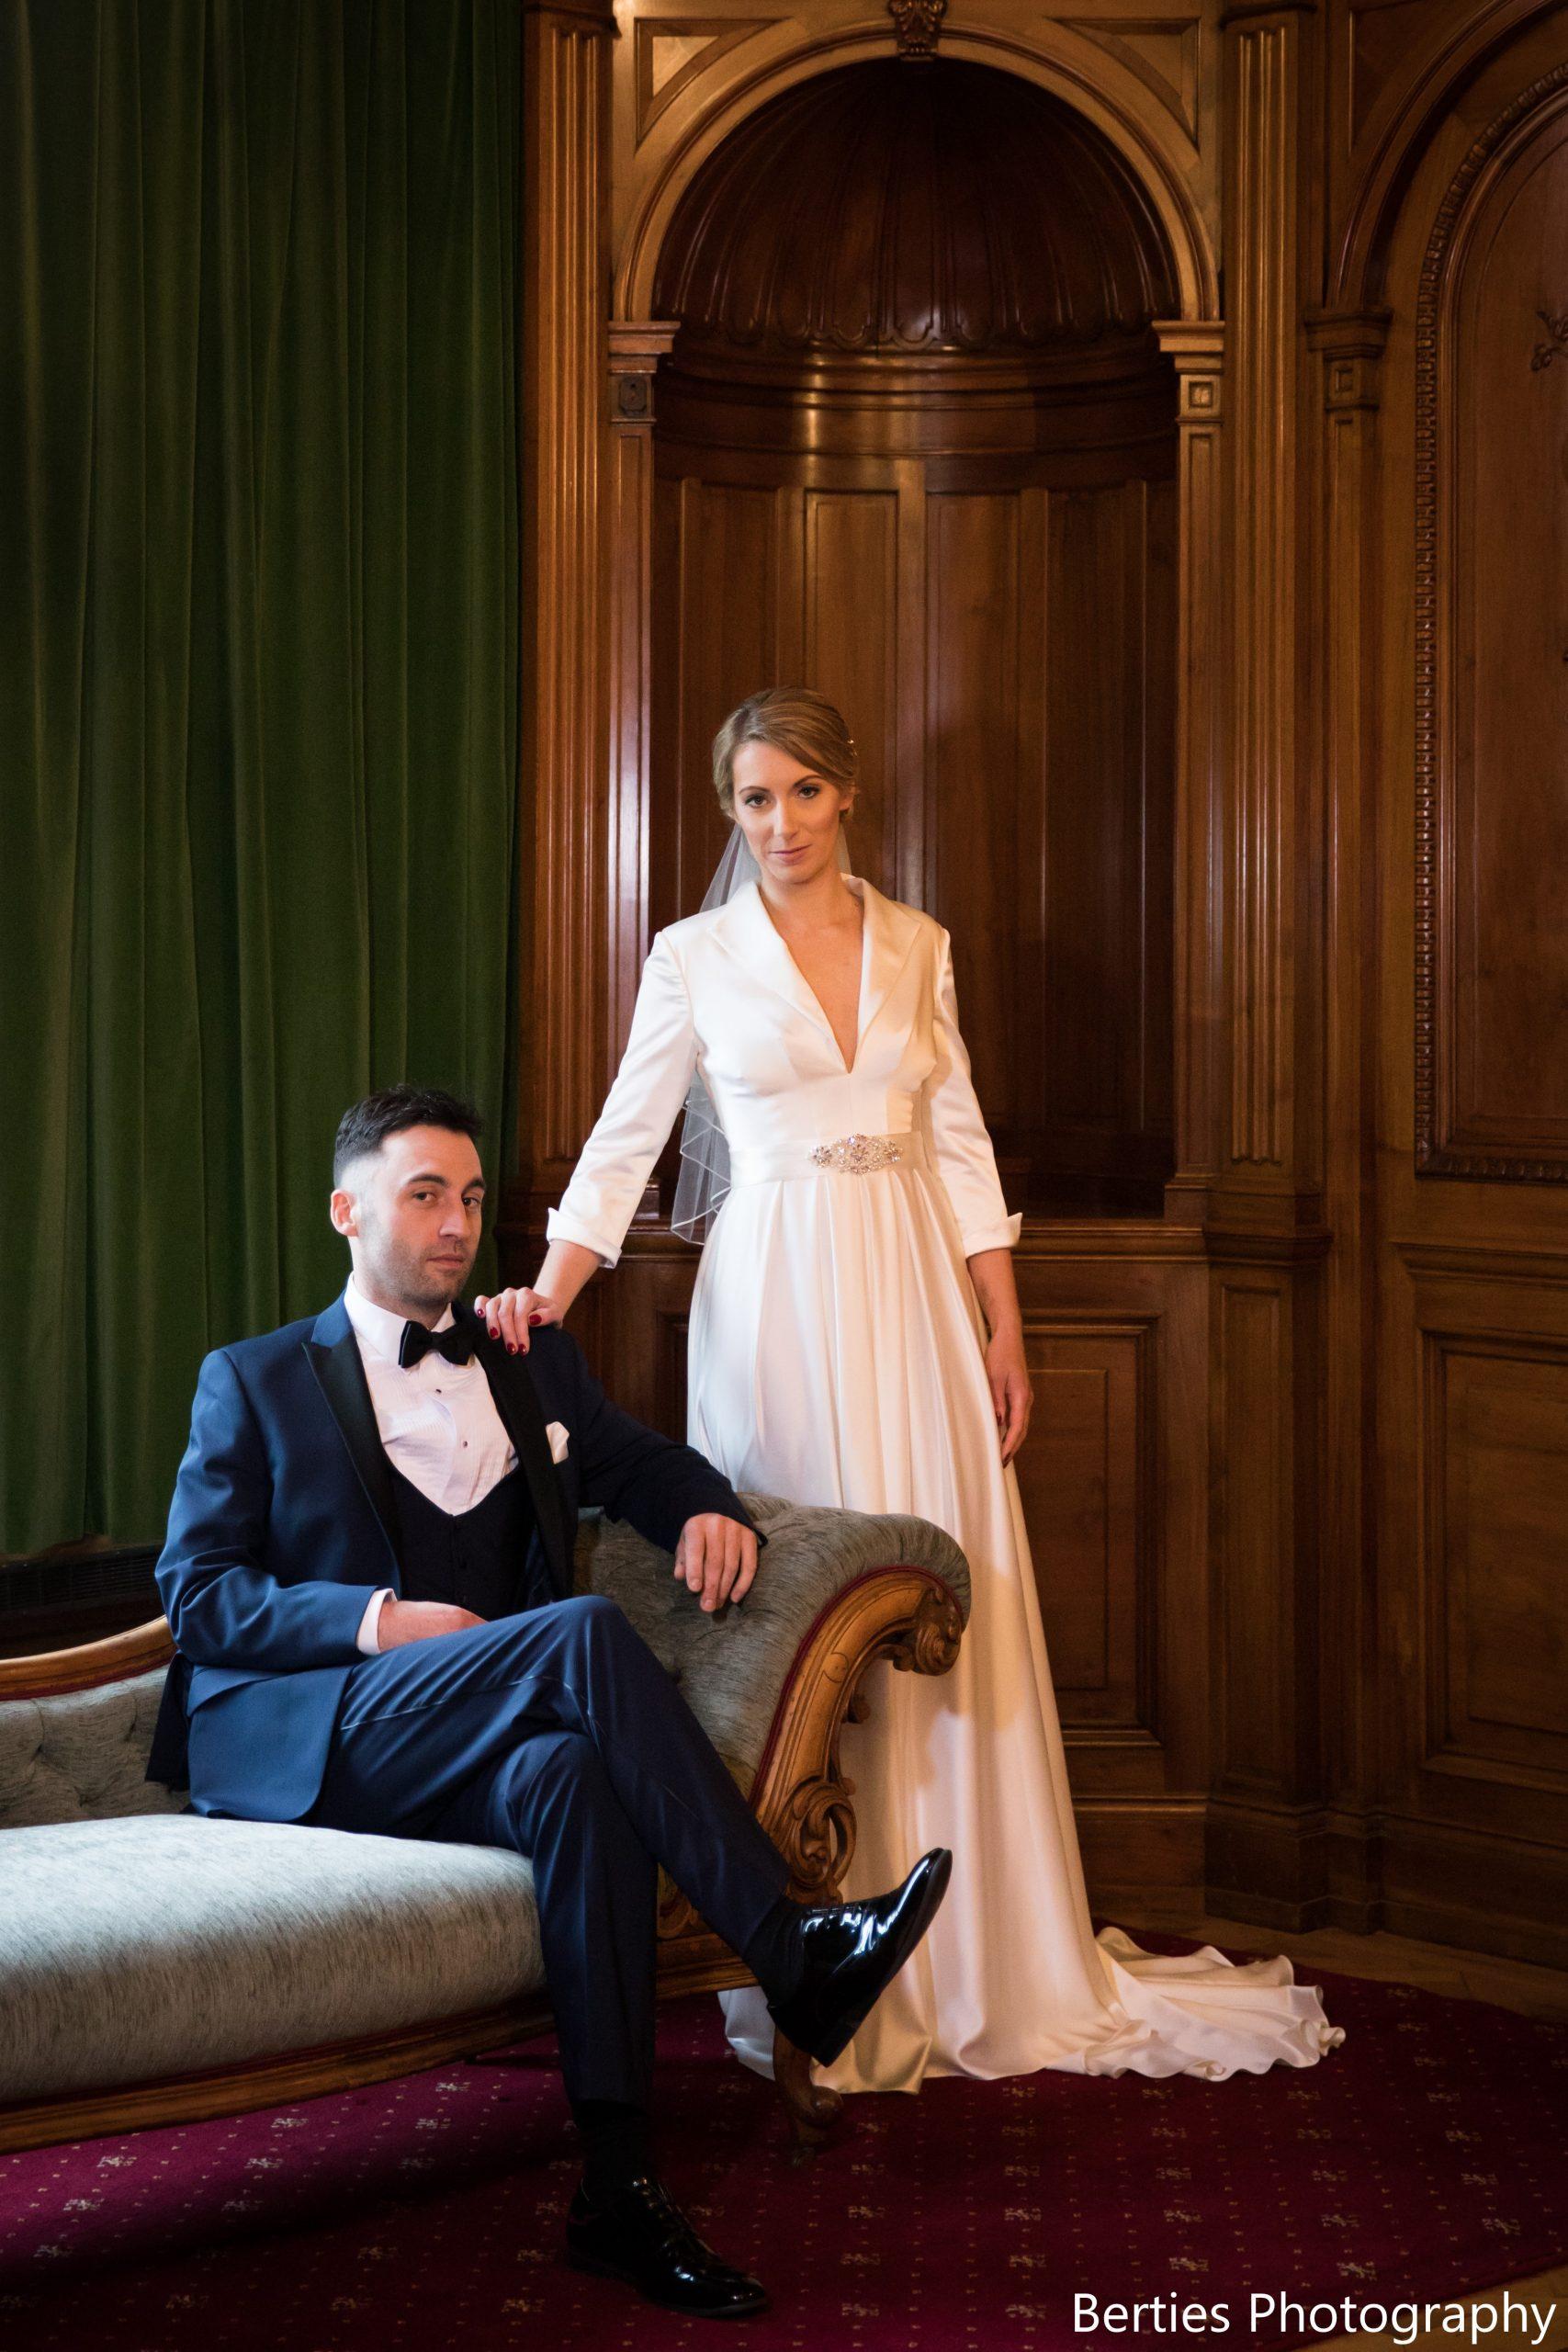 Wedding Bride and Groom in Navy Dinner Suit Tuxedo with black bow tie by Black Tie Menswear, Berkshire